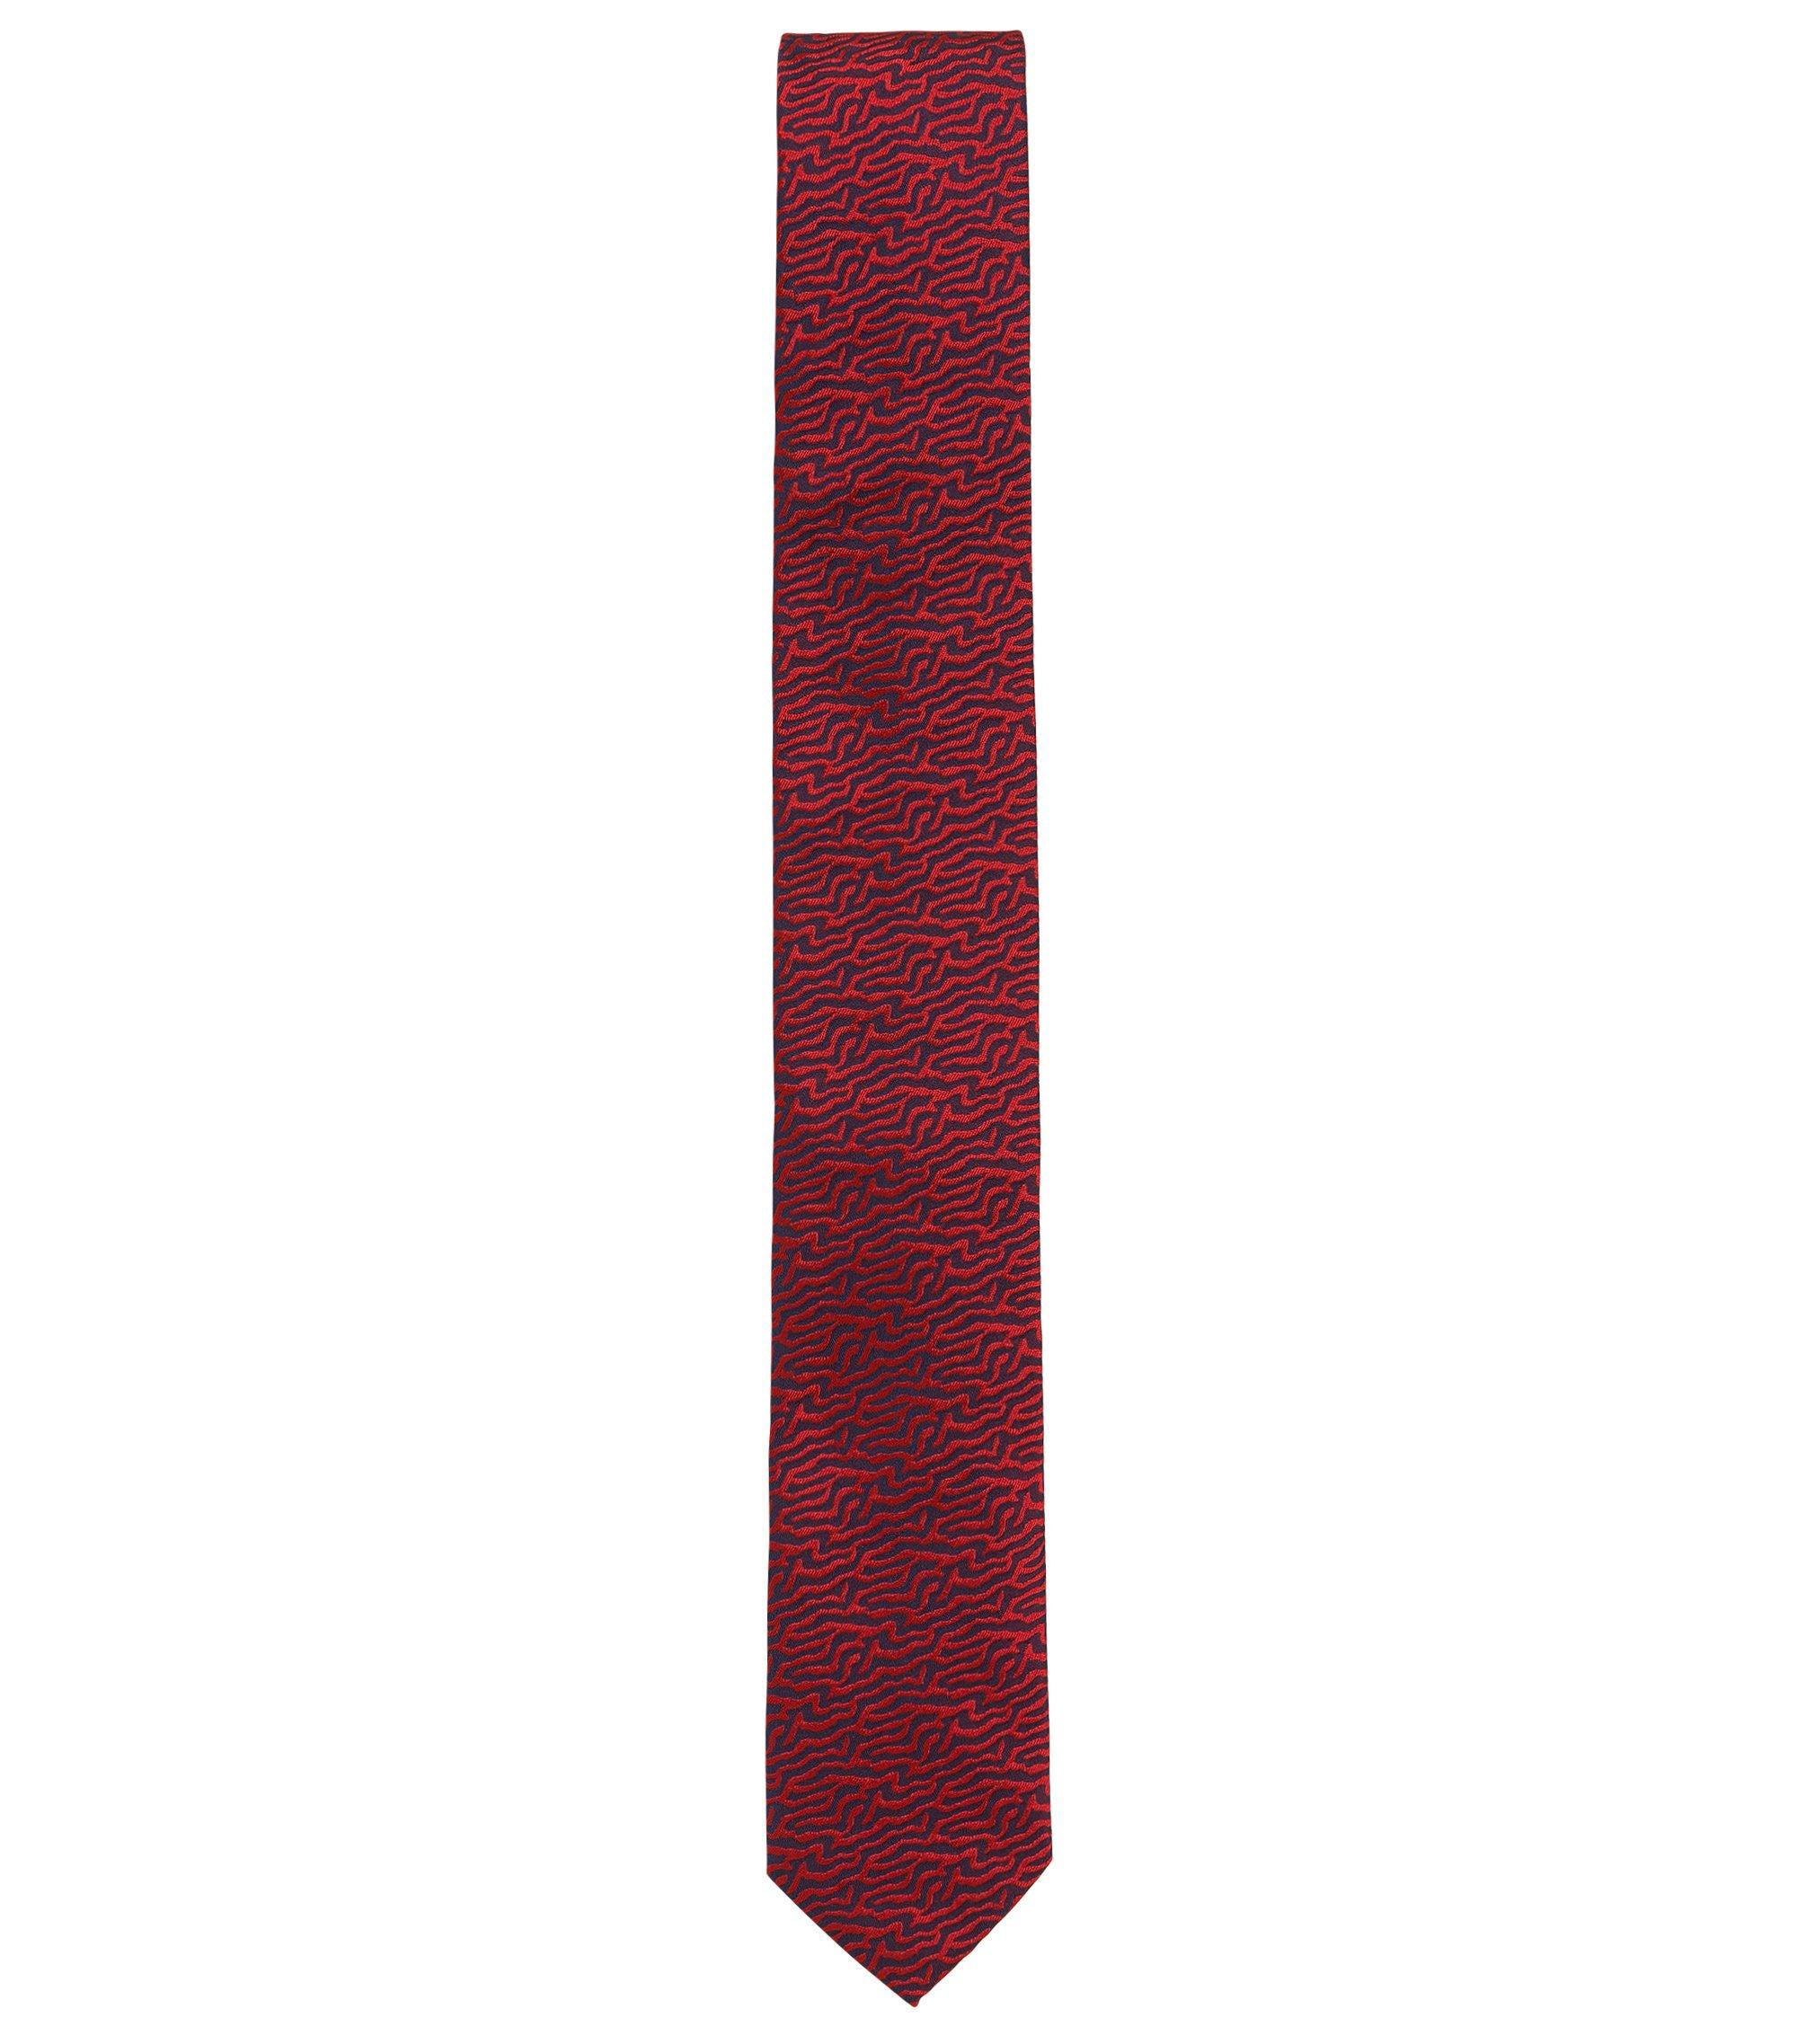 Jacquard-Krawatte aus reiner Seide , Rot